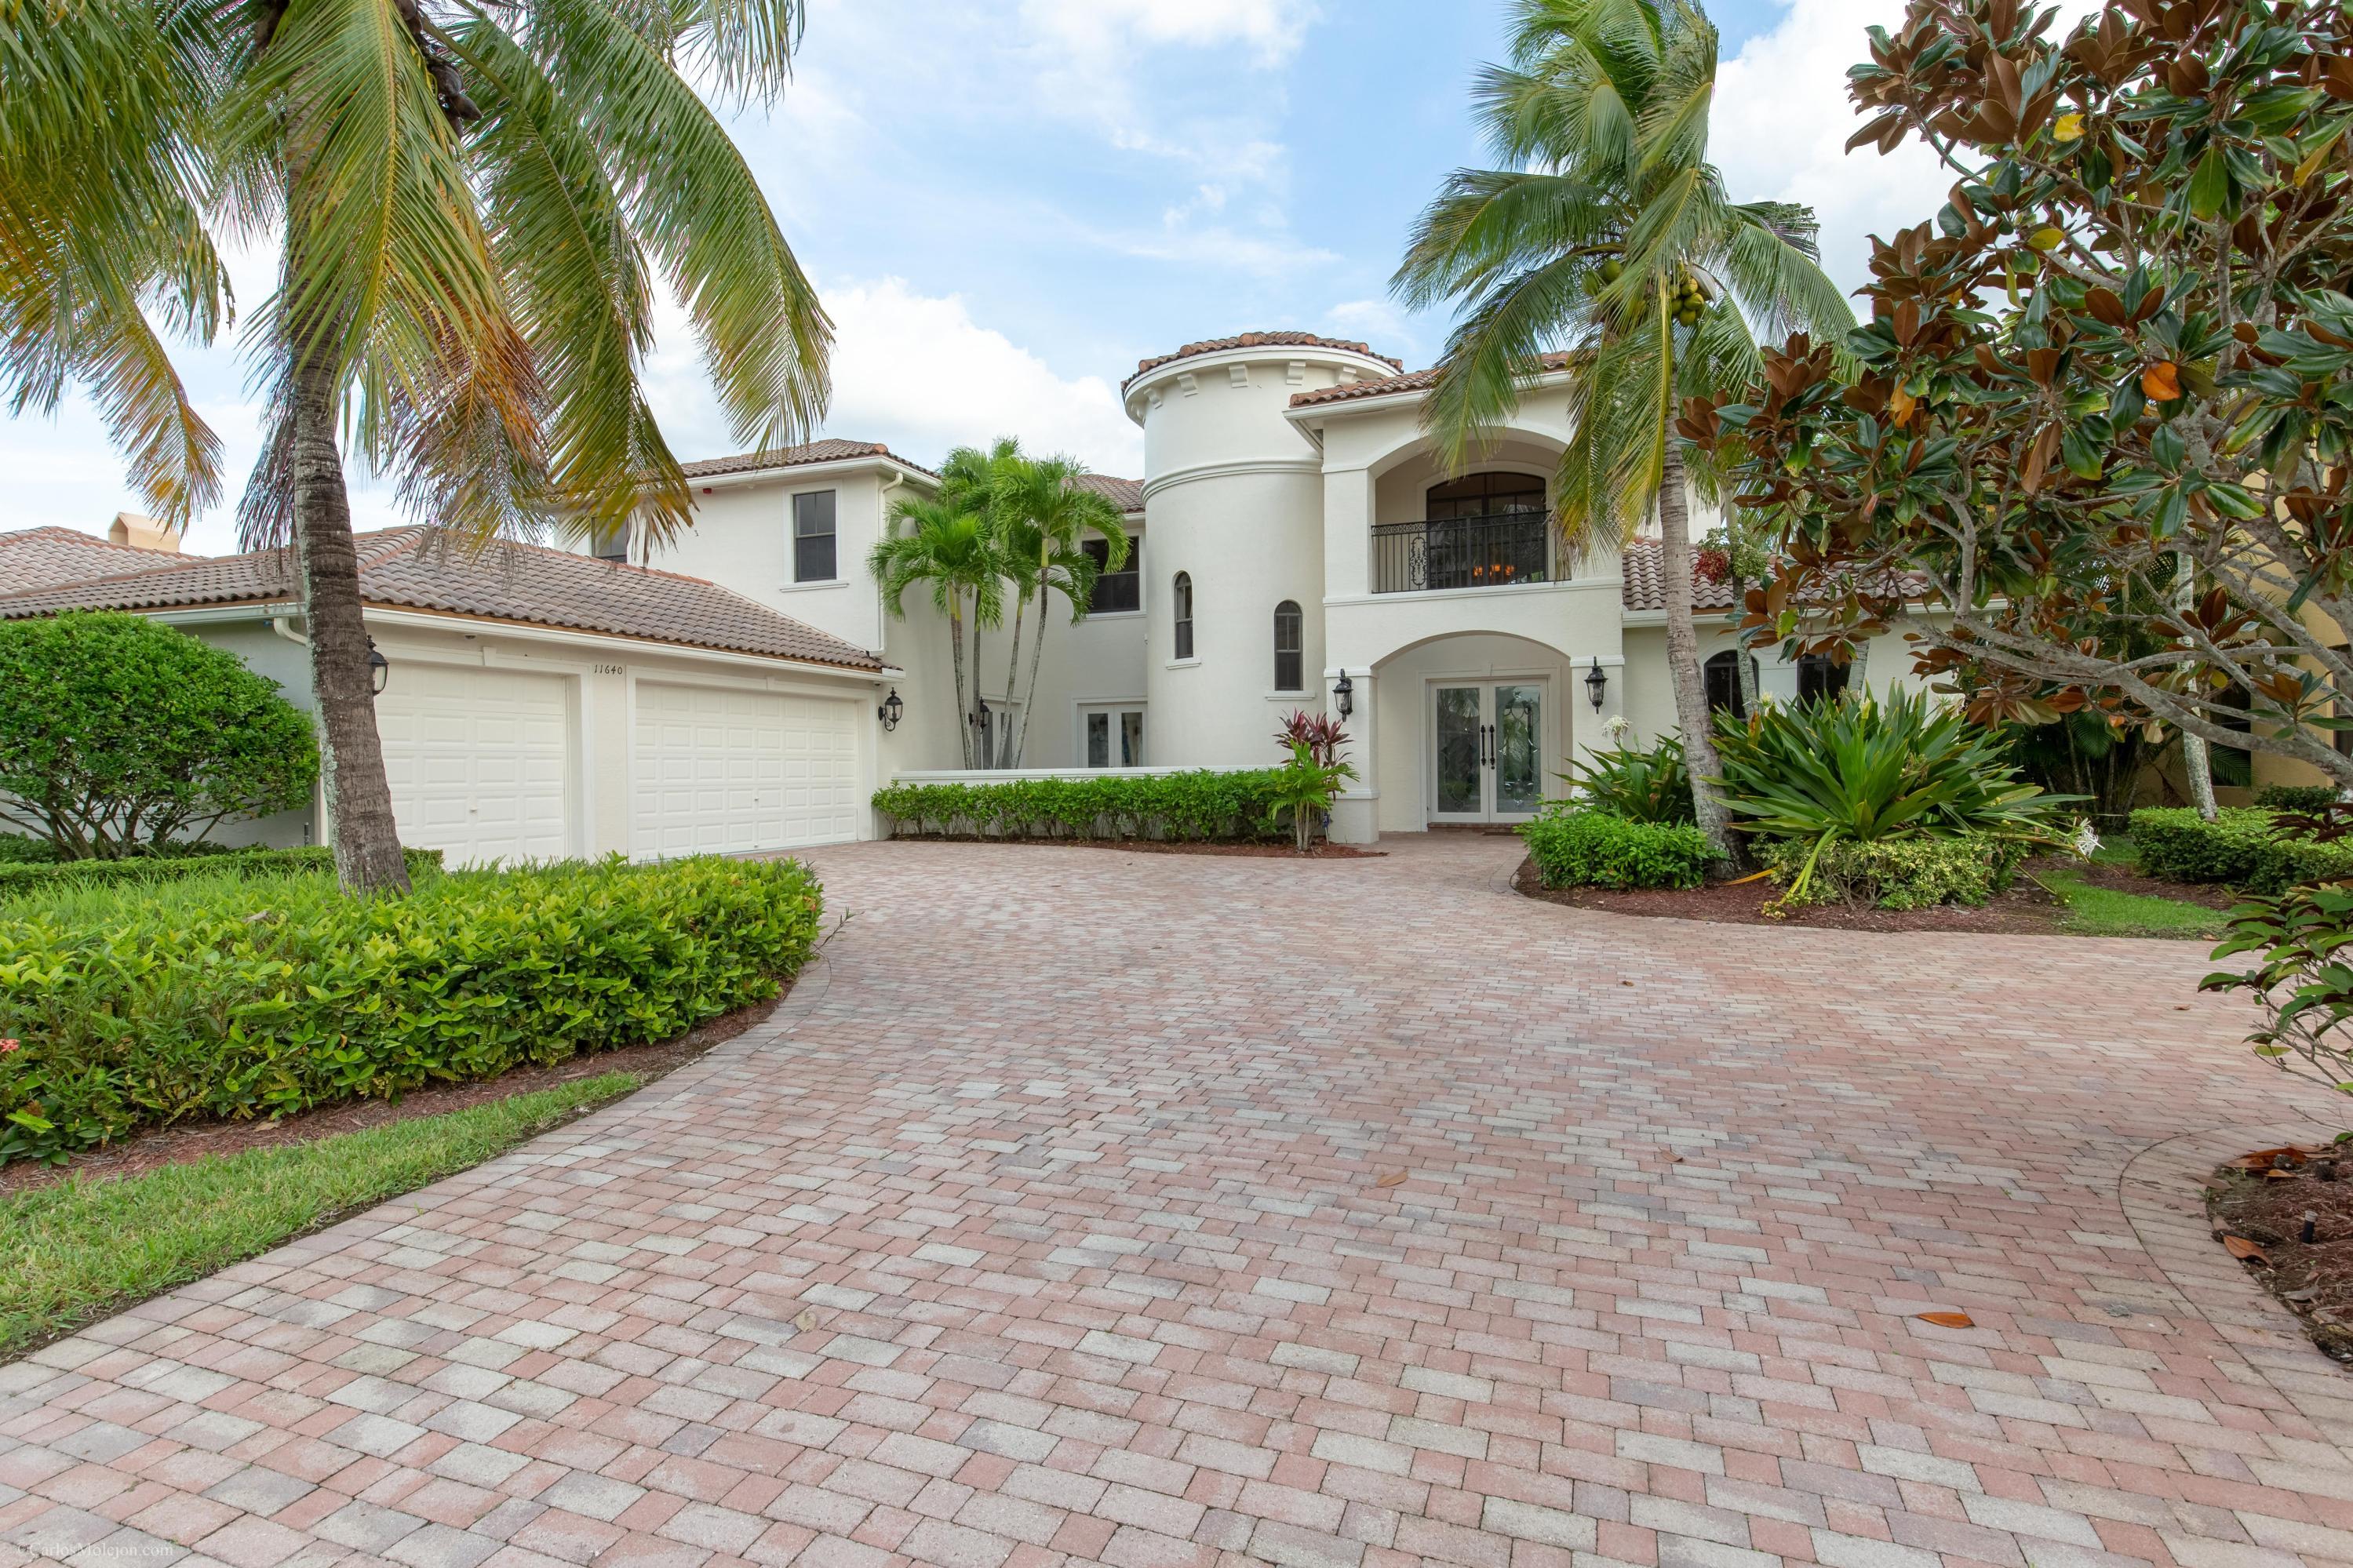 11640 Sea Court, Wellington, Florida 33414, 4 Bedrooms Bedrooms, ,4.1 BathroomsBathrooms,Single Family,For Sale,Sea,RX-10477640